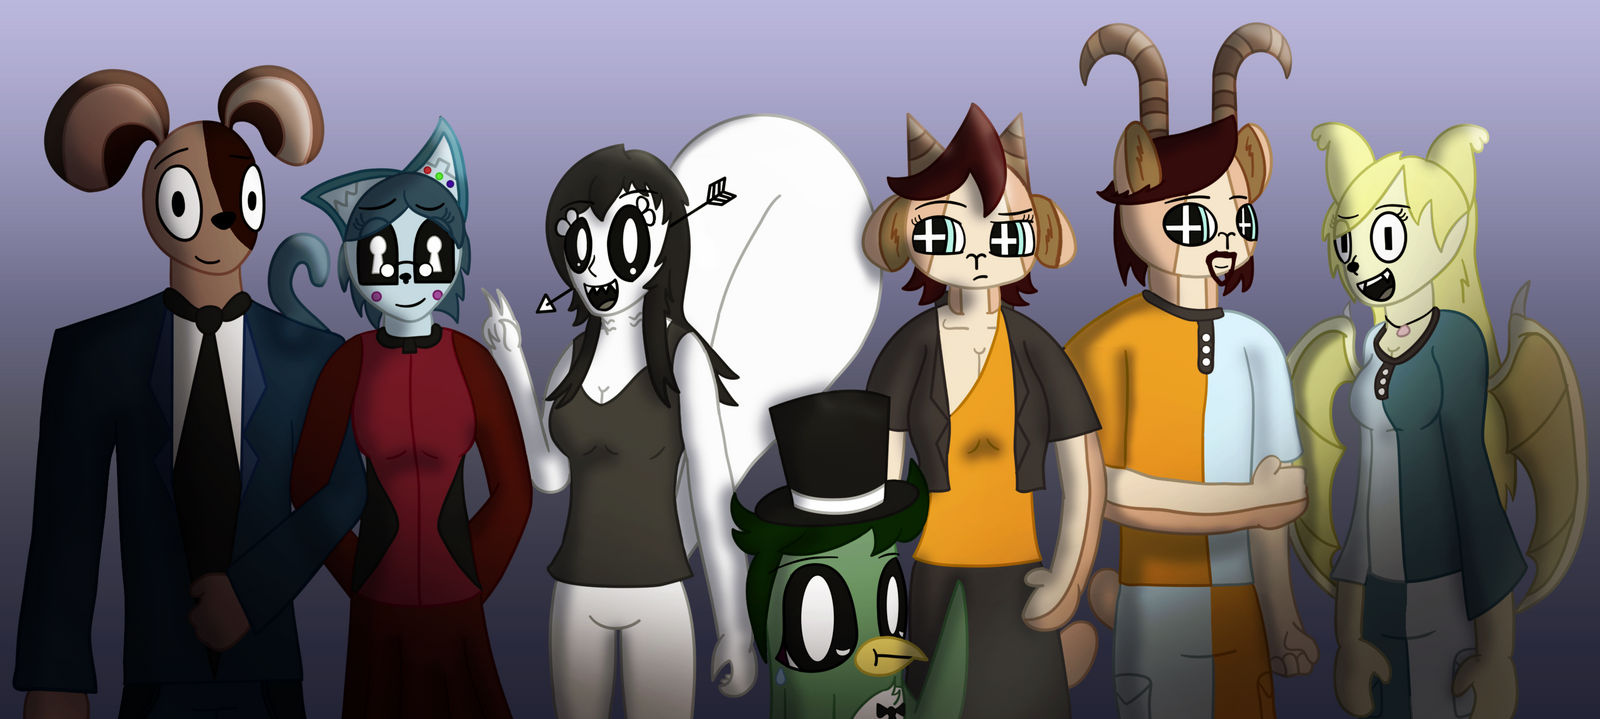 Nyah Has an Adventure Cast Poster v2